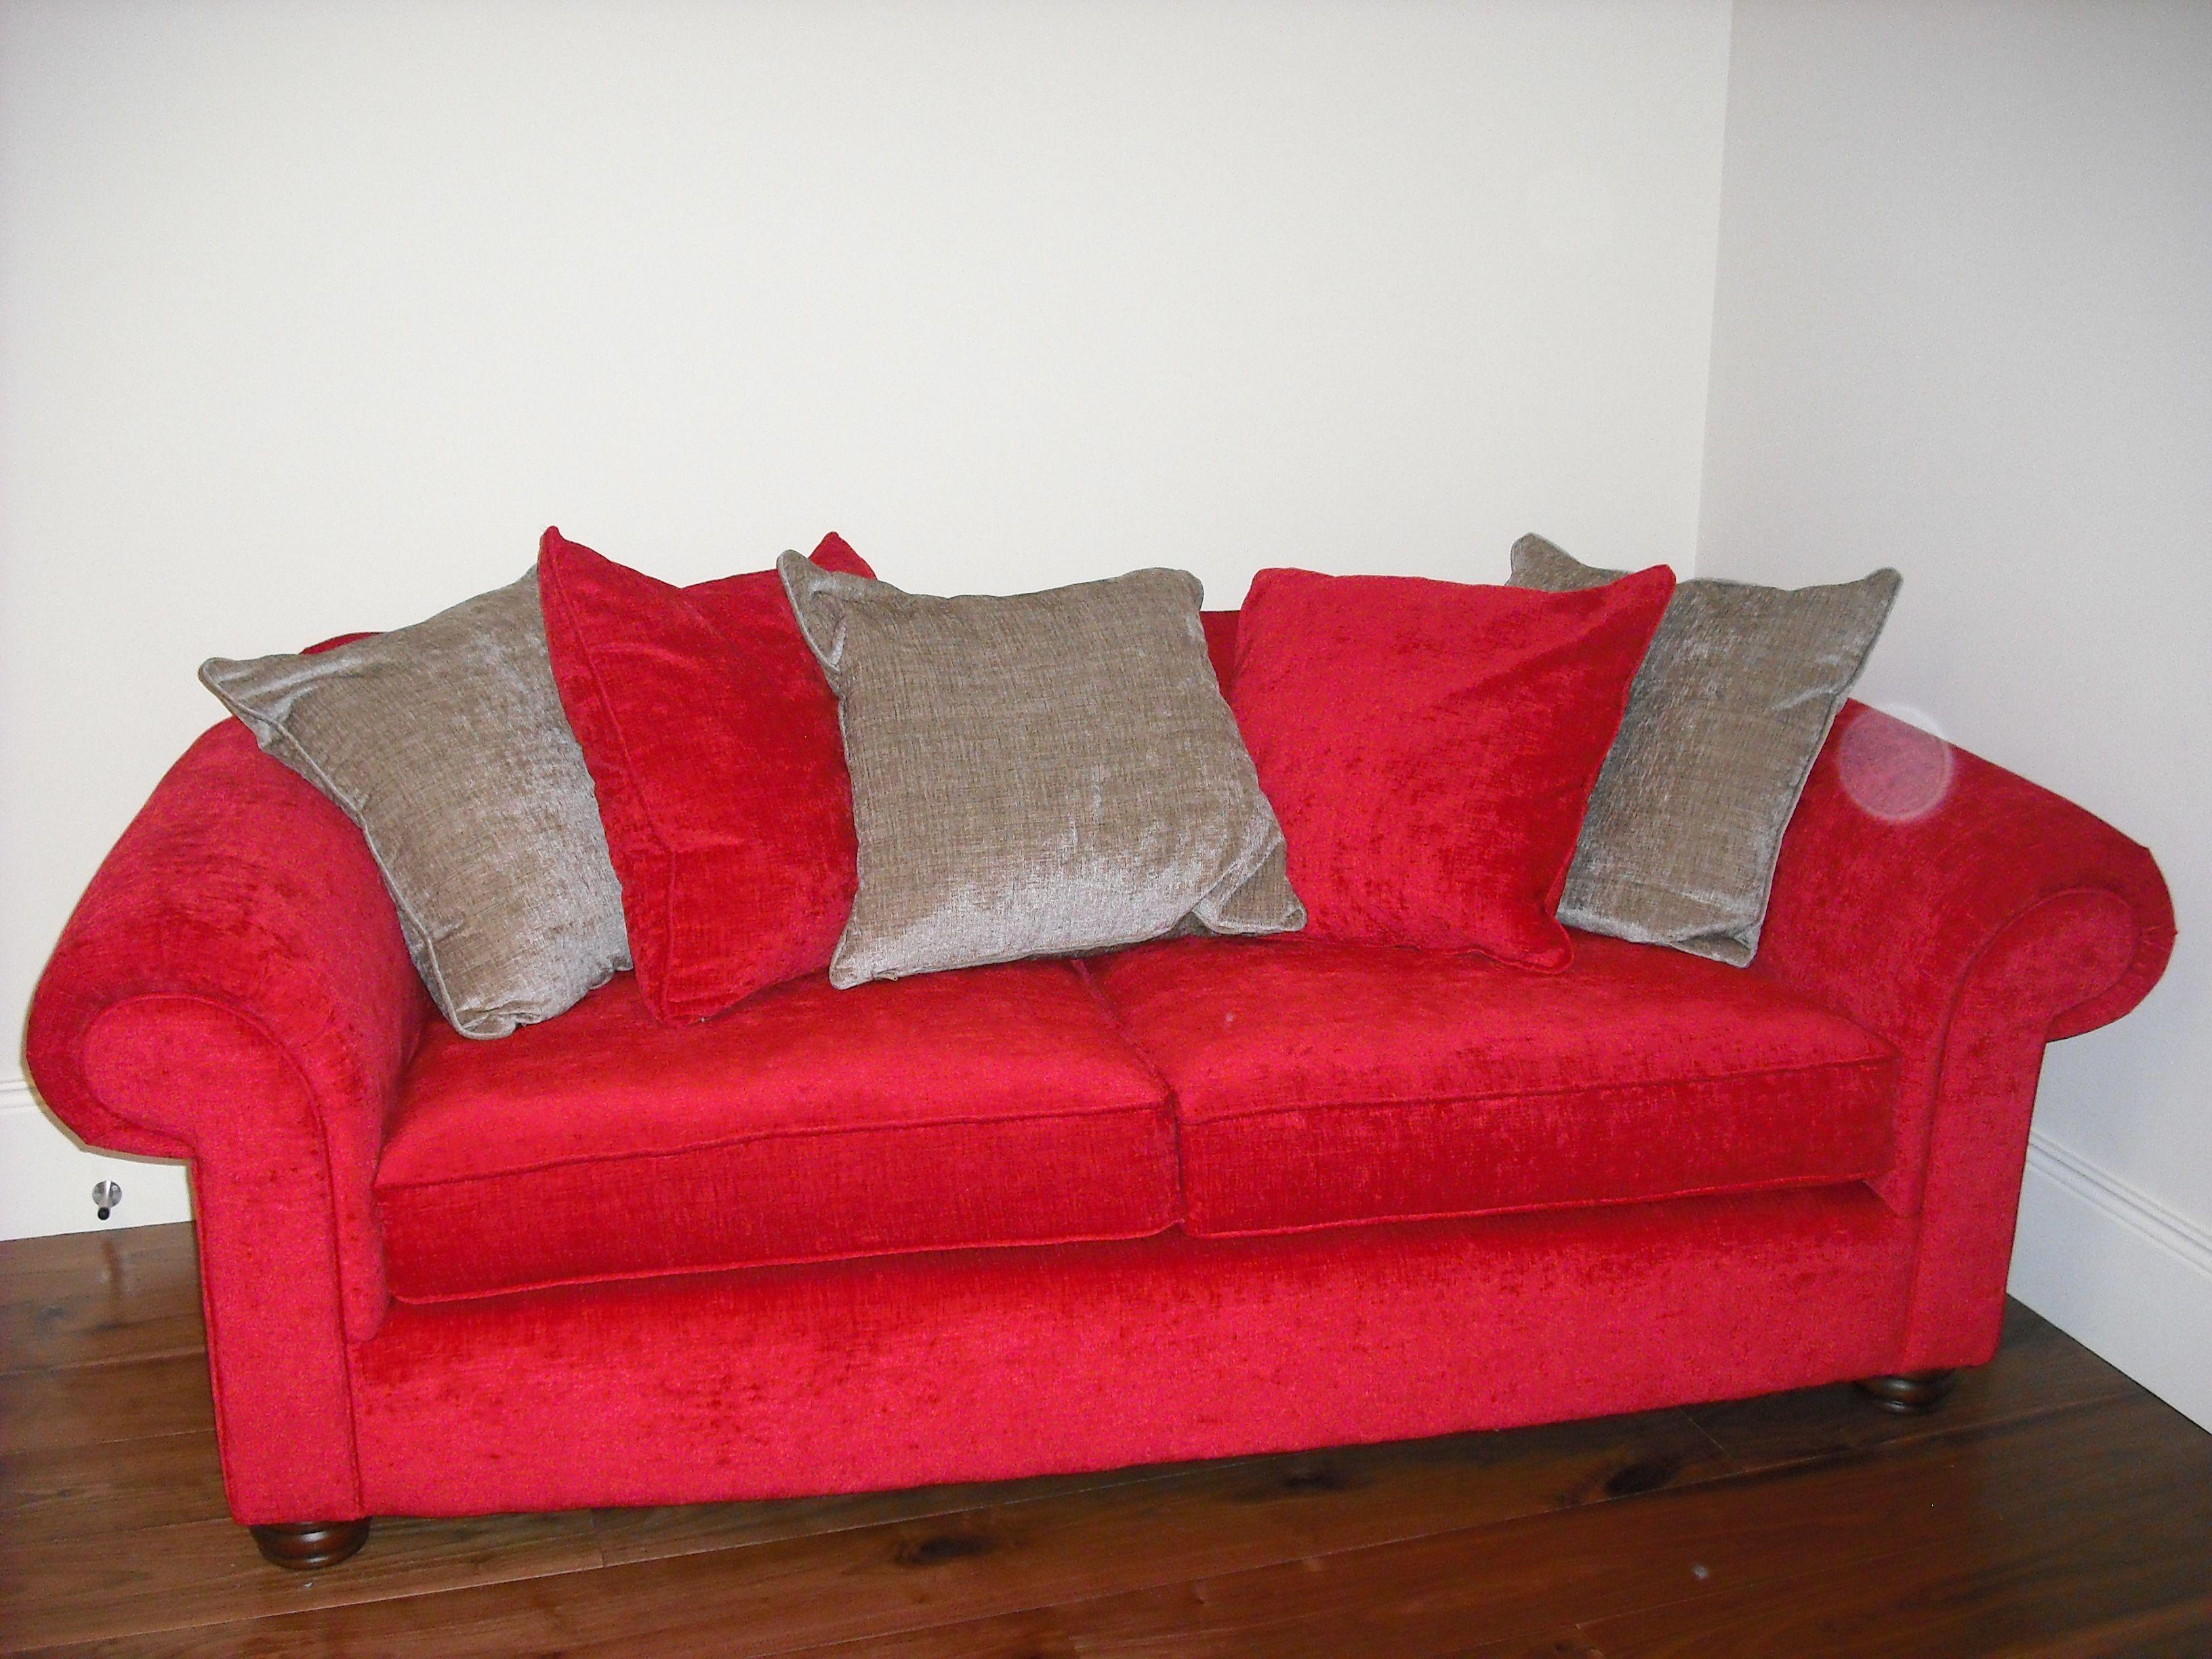 Plush red velvet sofa available from conbu interior design